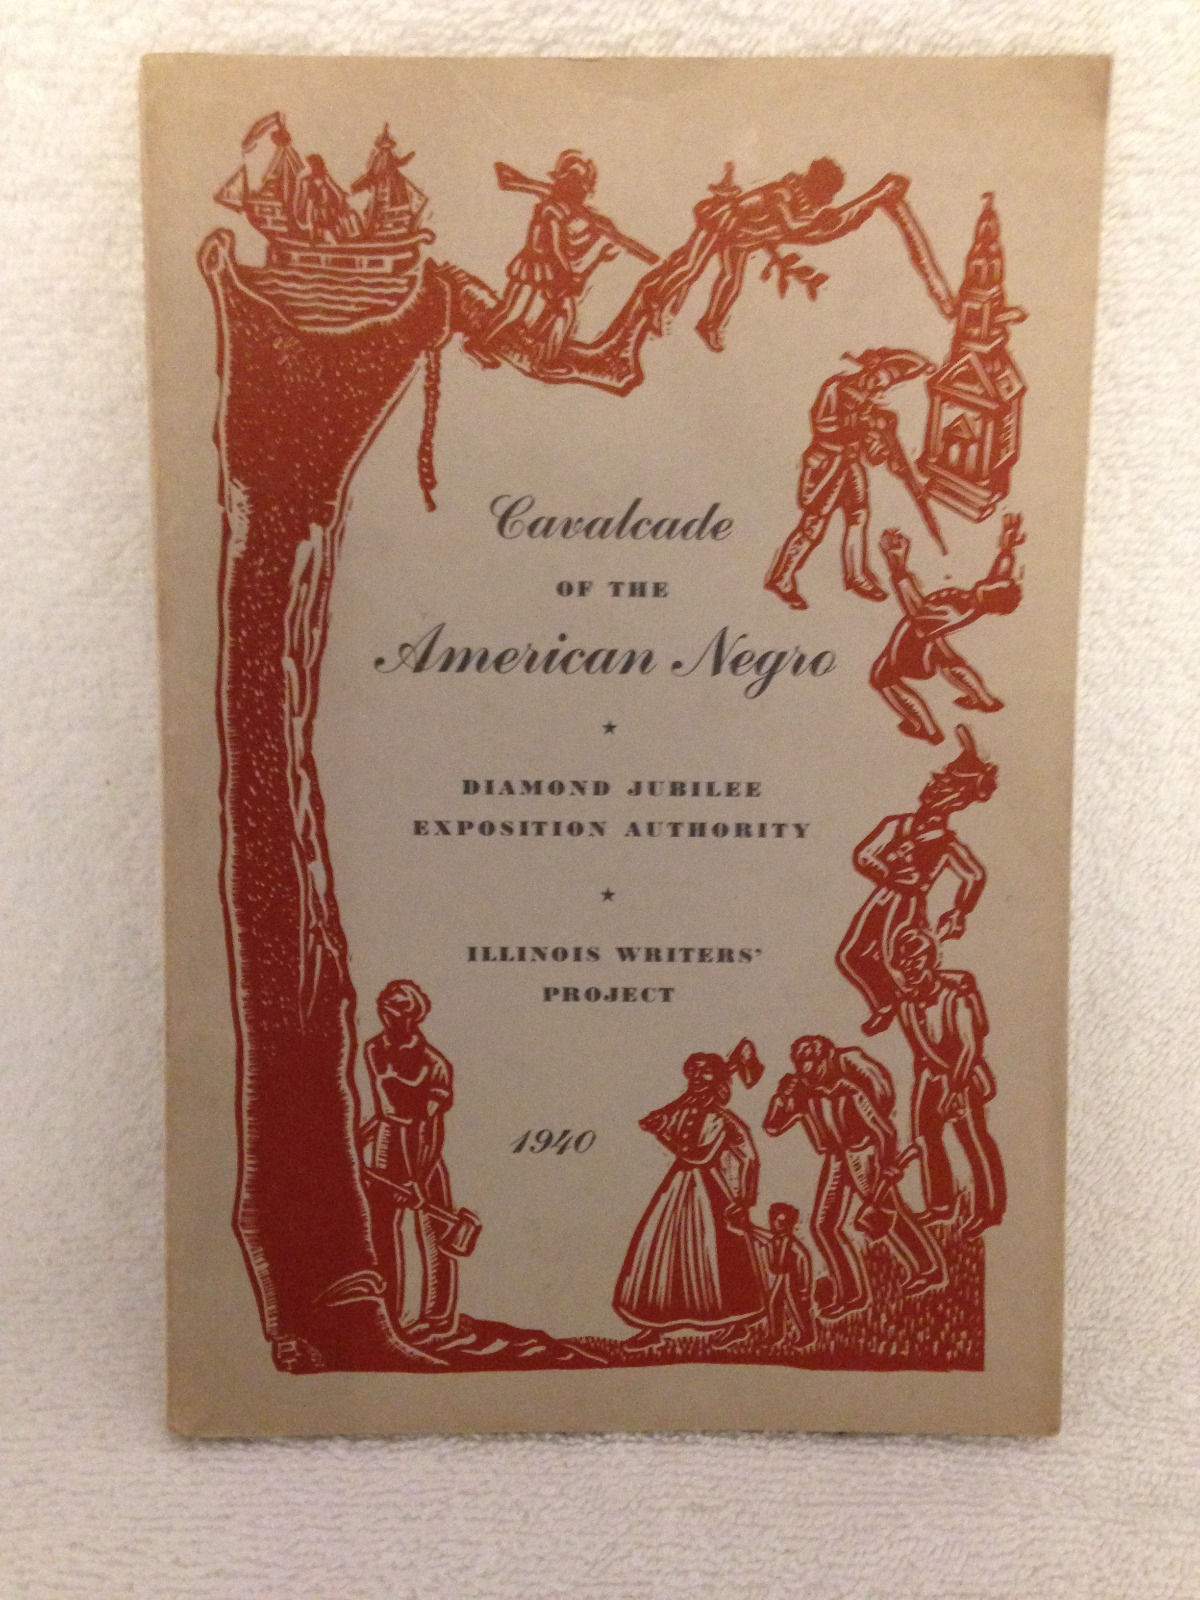 Cavalcade of the American Negro, Diamond Jubilee Expo